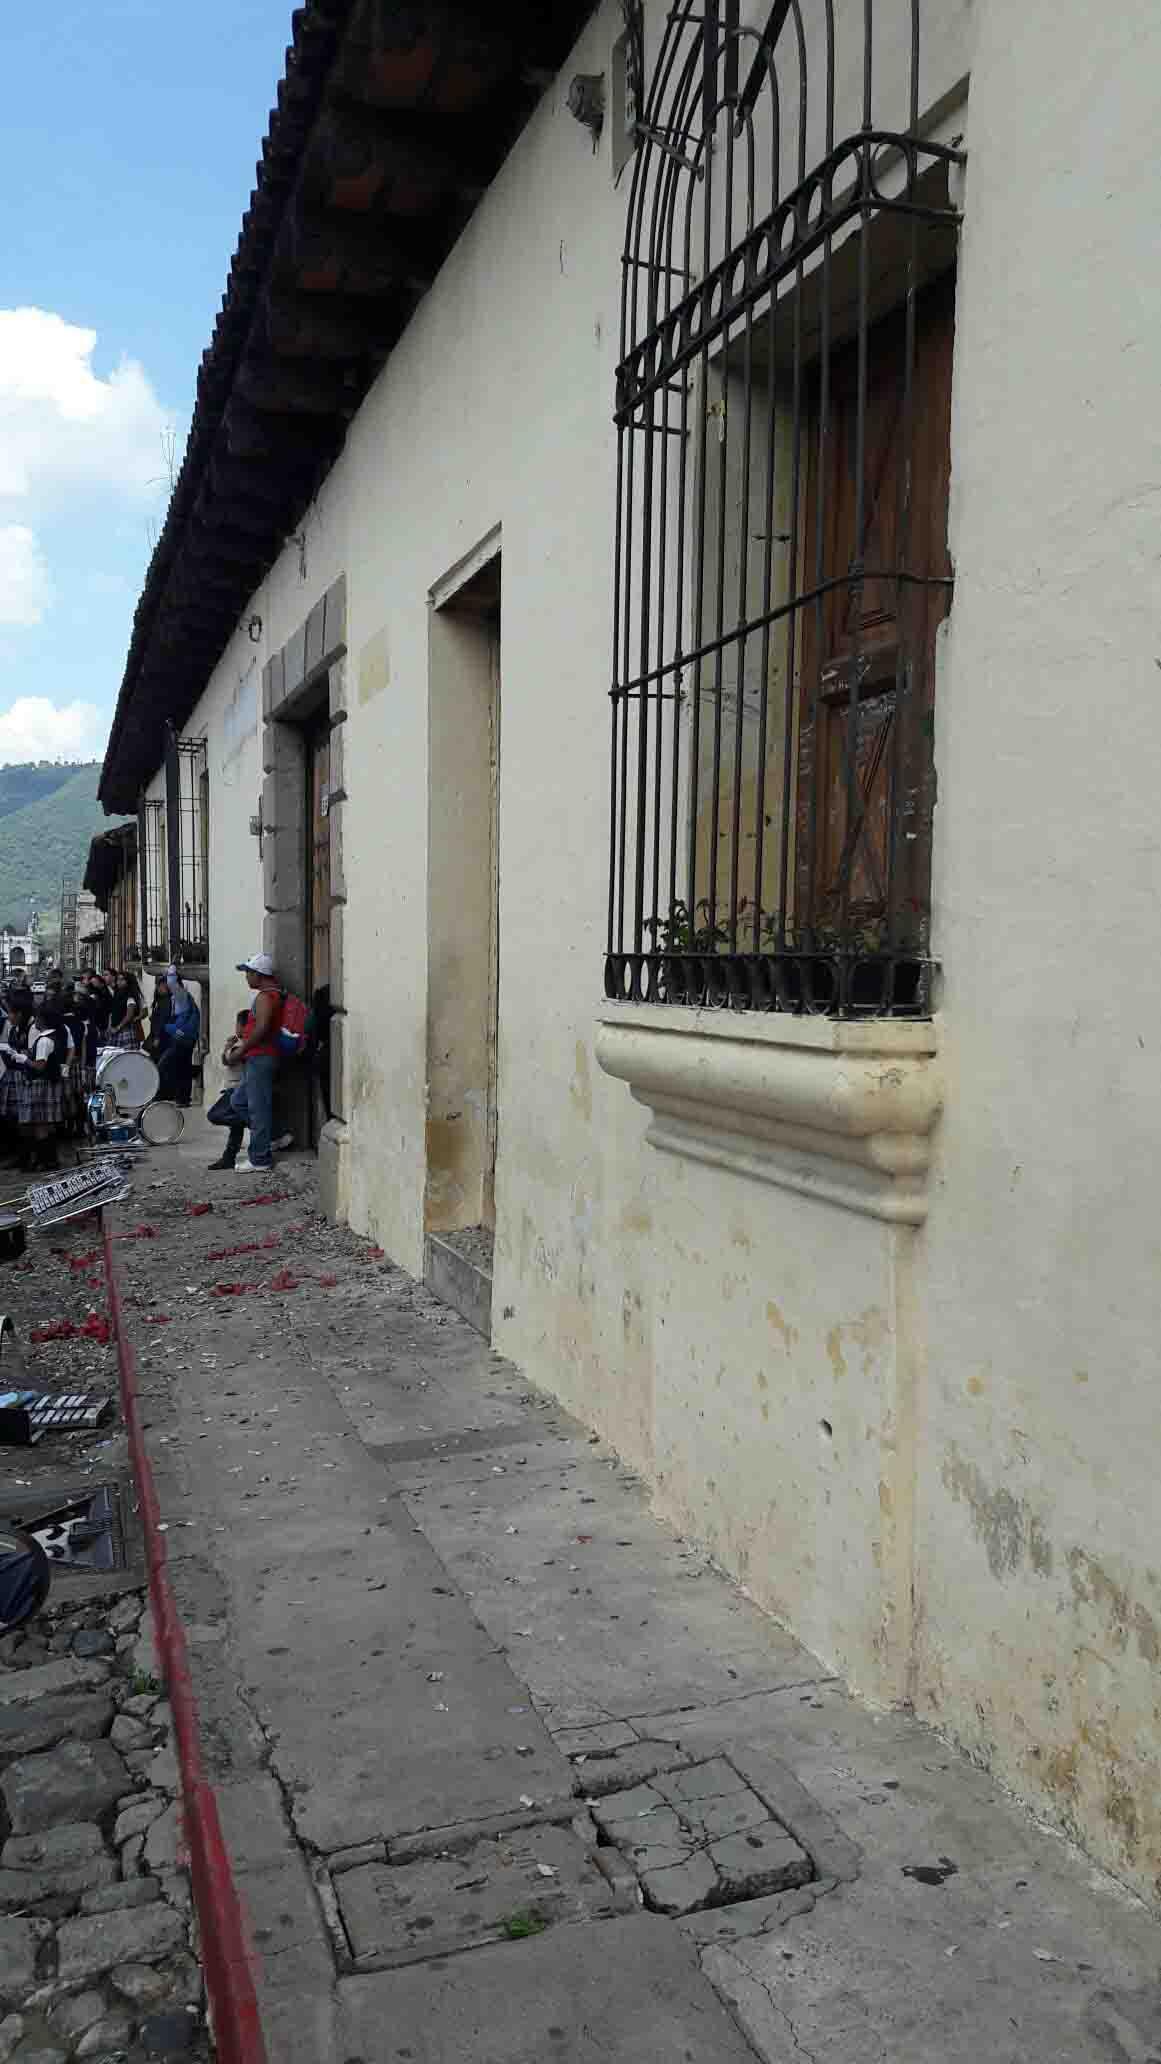 VENTA CASA GRANDE EN CENTRO DE ANTIGUA GUATEMALA IDEAL PARA HOTEL